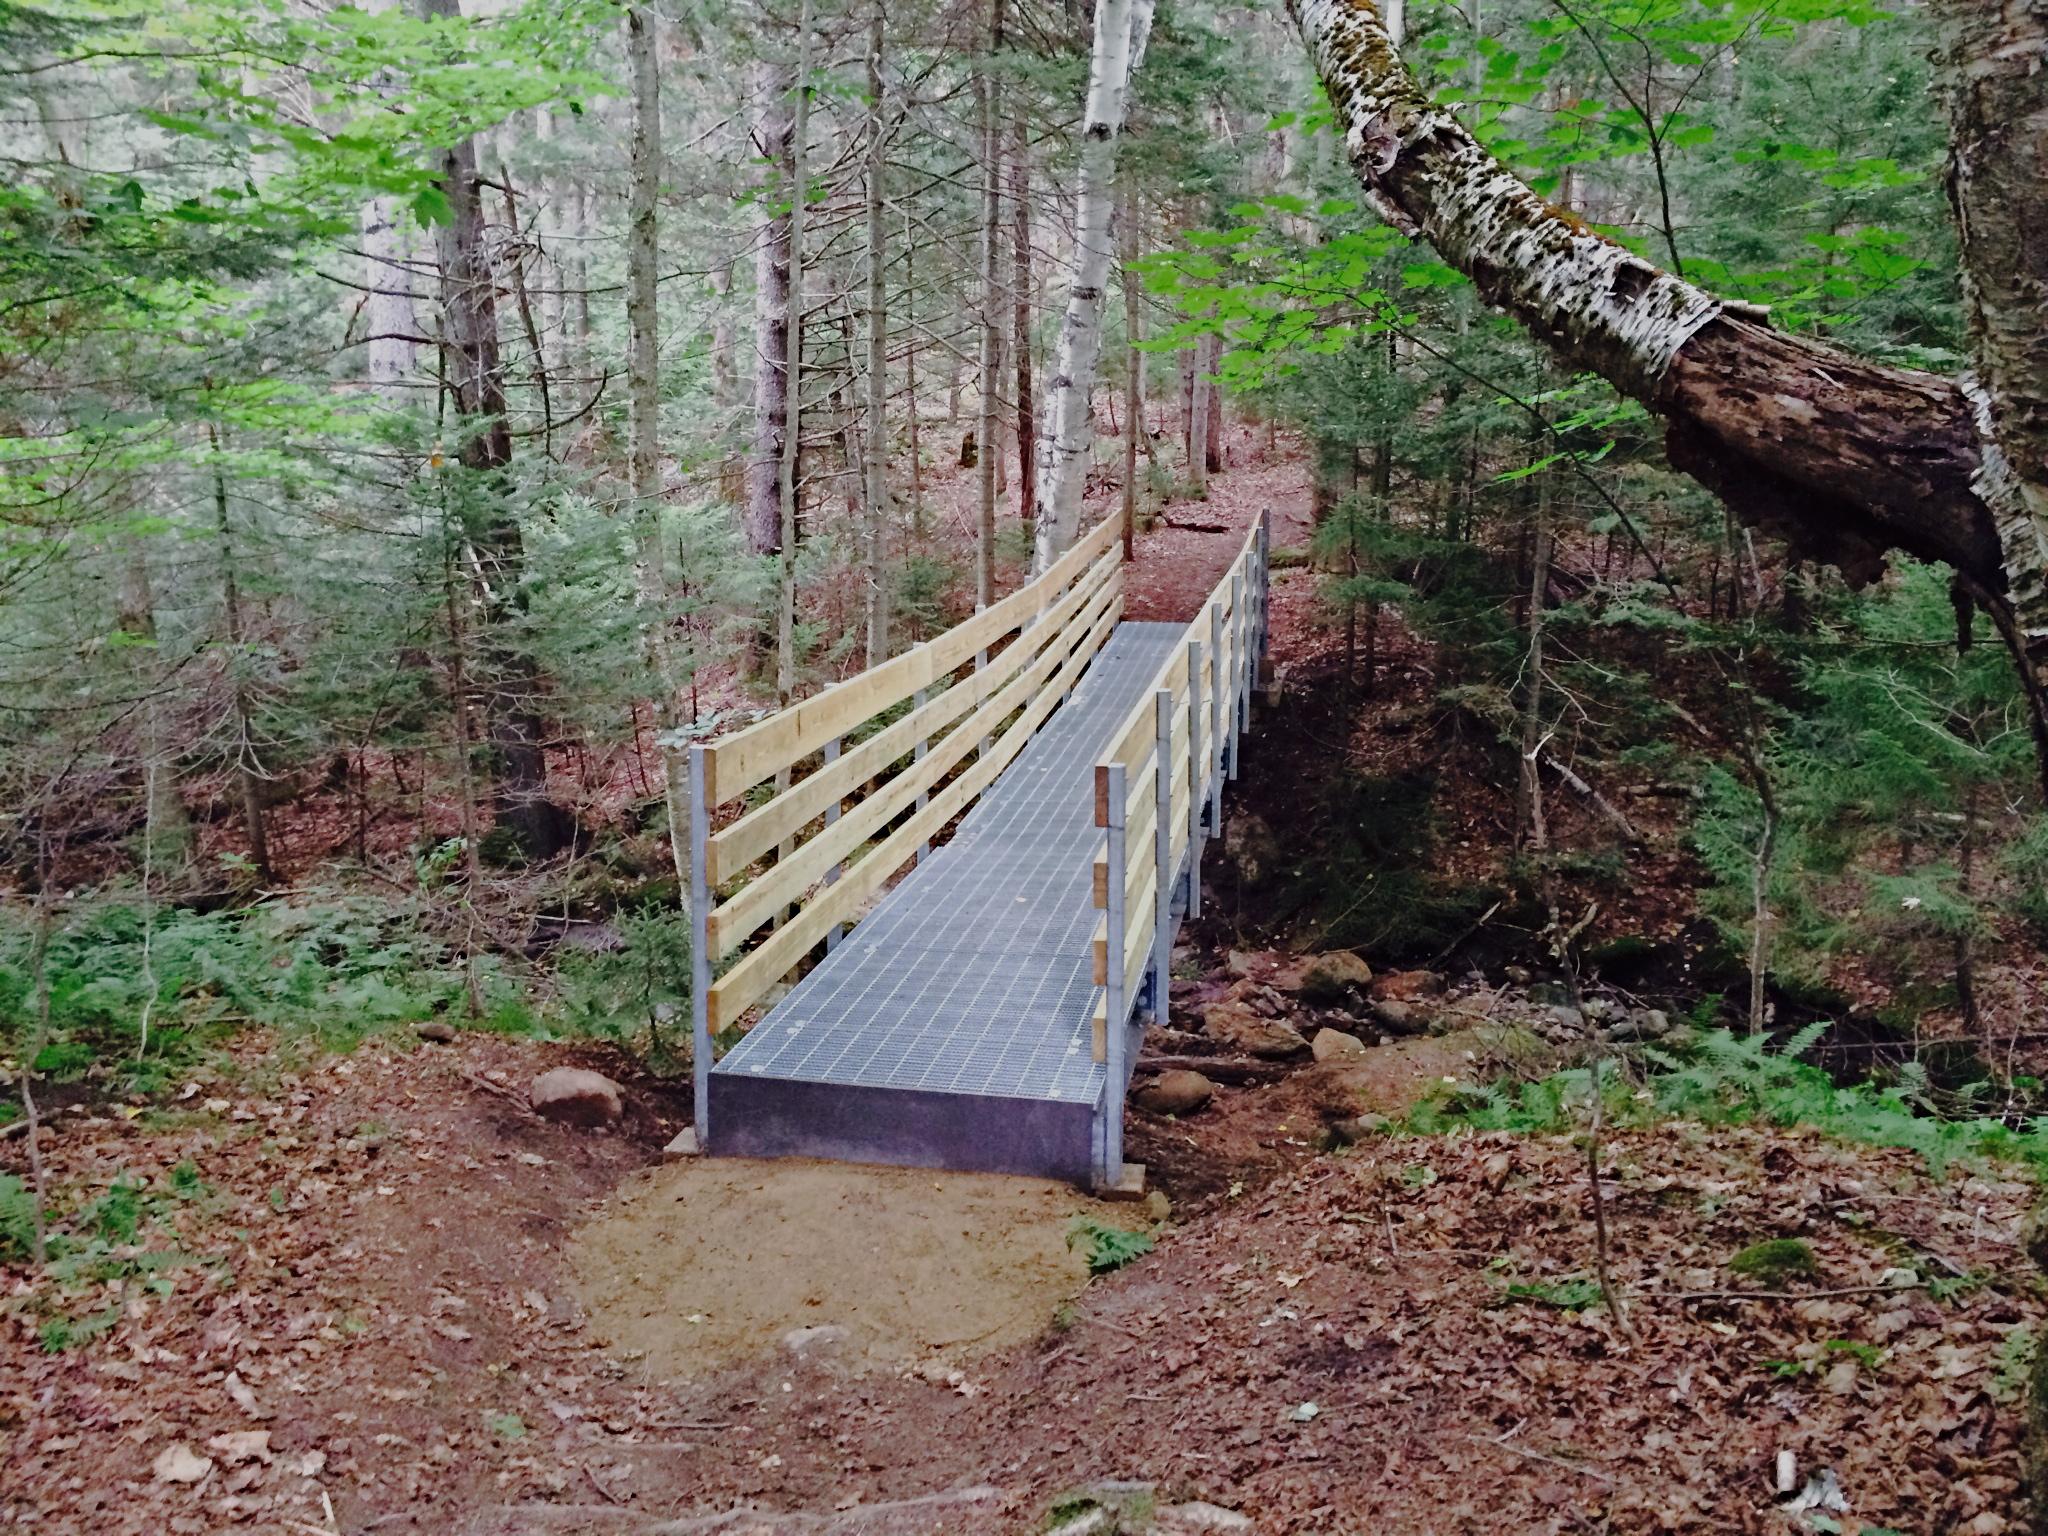 35ft steel bridge on Mount Olga trail in Molly Stark State Park, Vermont.